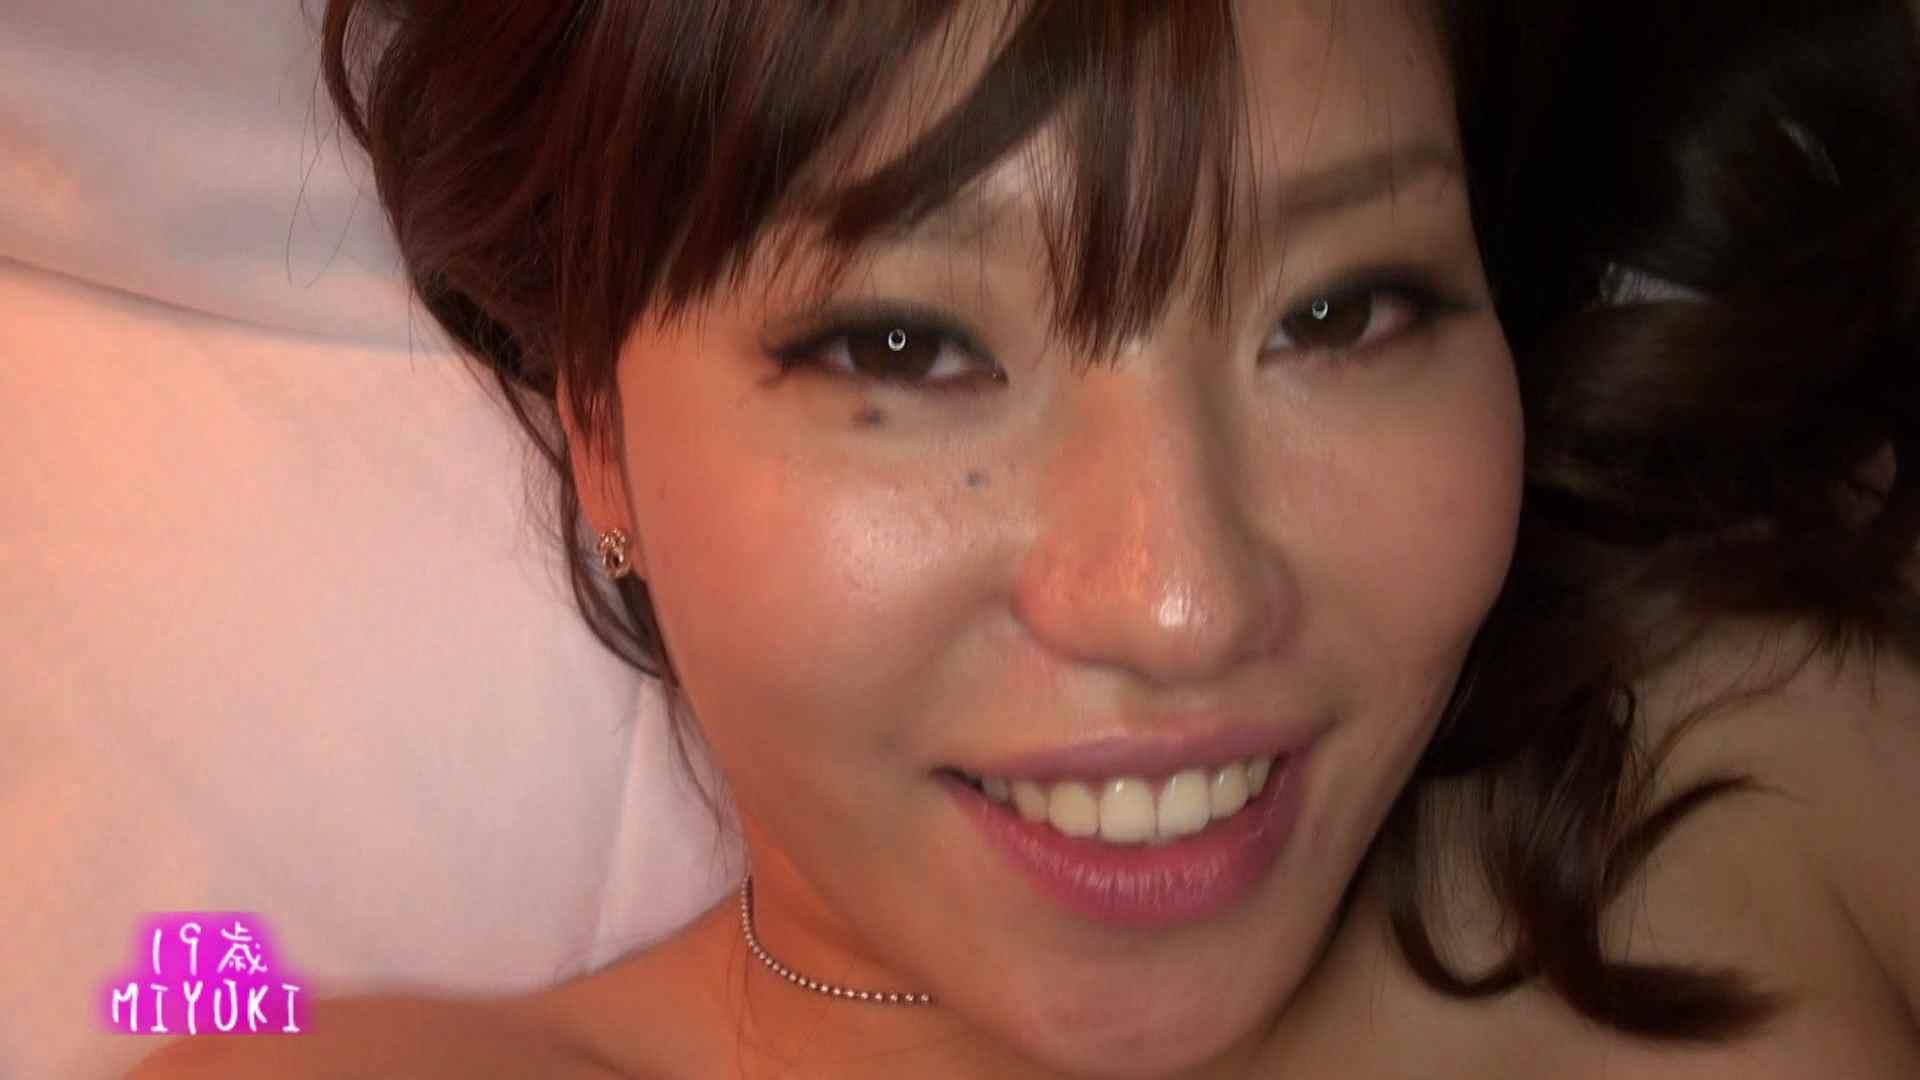 MIYUKIちゃんに男優さんがエロマッサージ マッサージ セックス画像 104pic 23